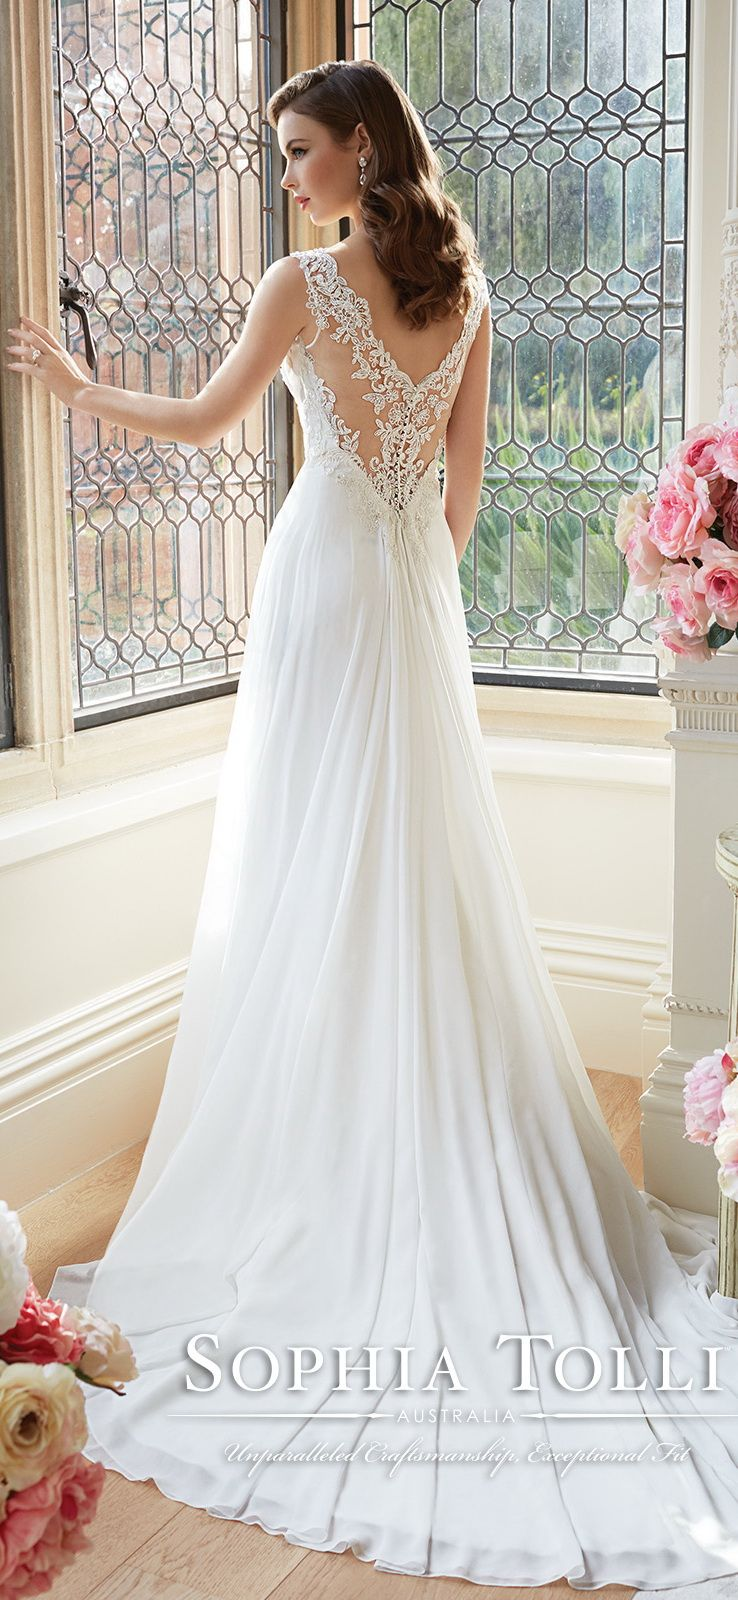 Sophia Tolli Wedding Dresses Collec… | The Wedding Pros | The ...